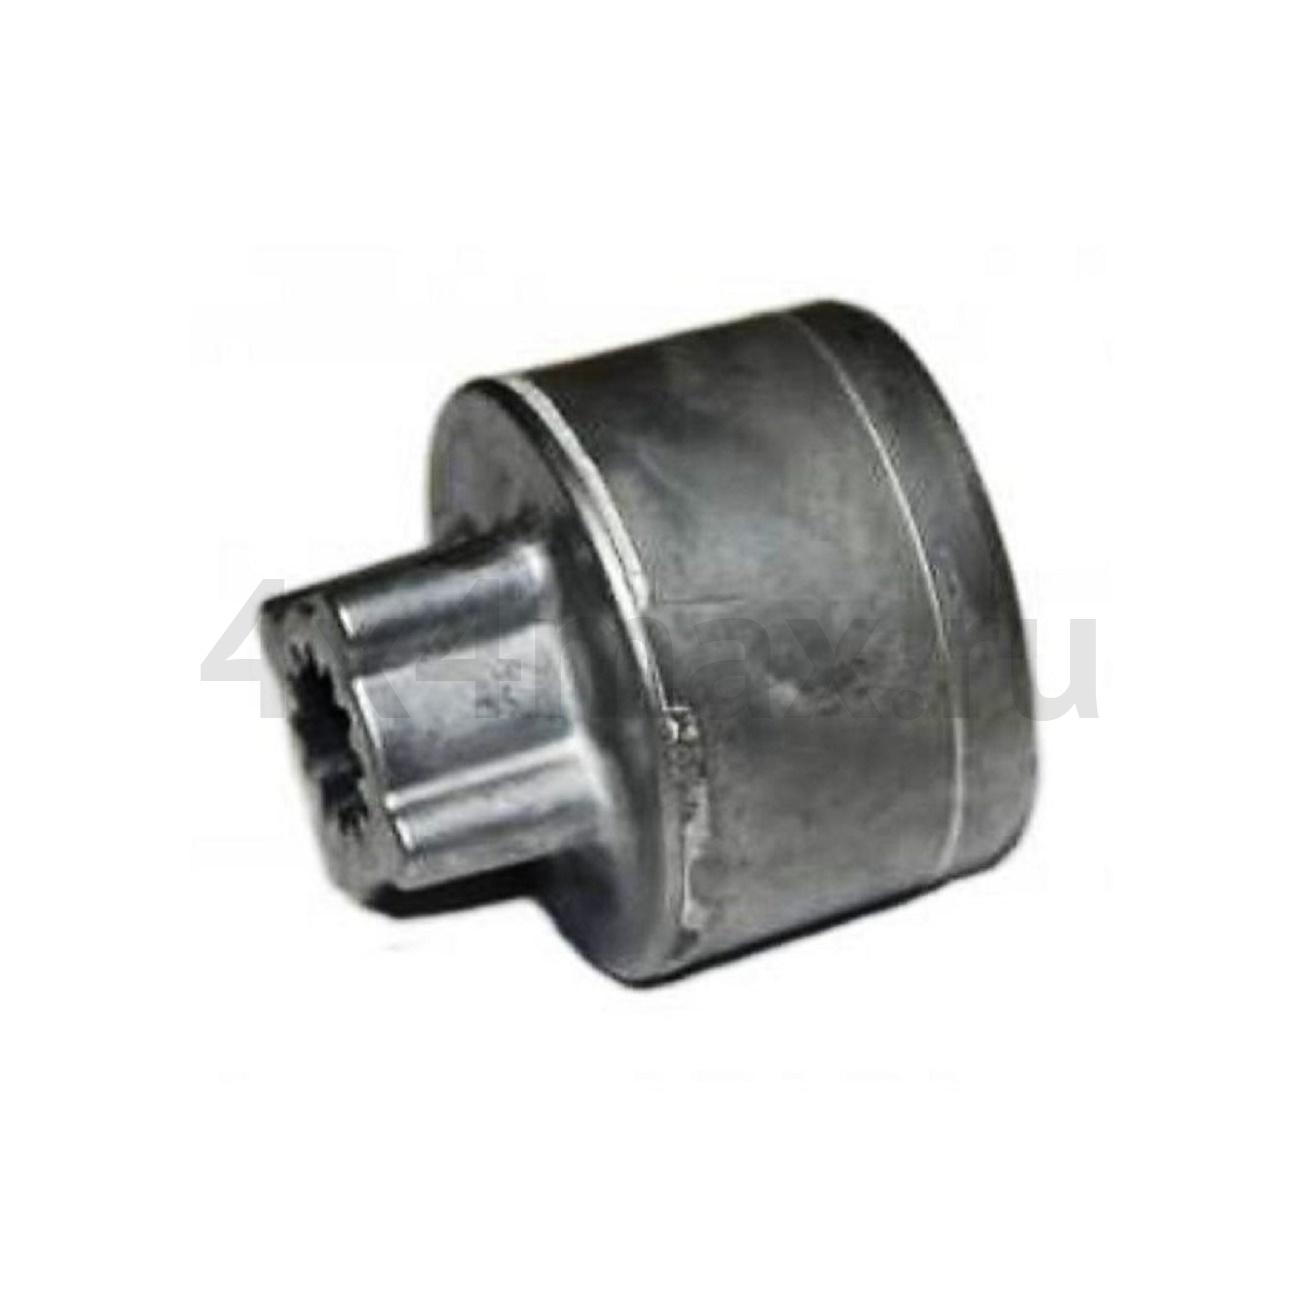 Warn Hs9500 Wiring Diagram For 39480 1040